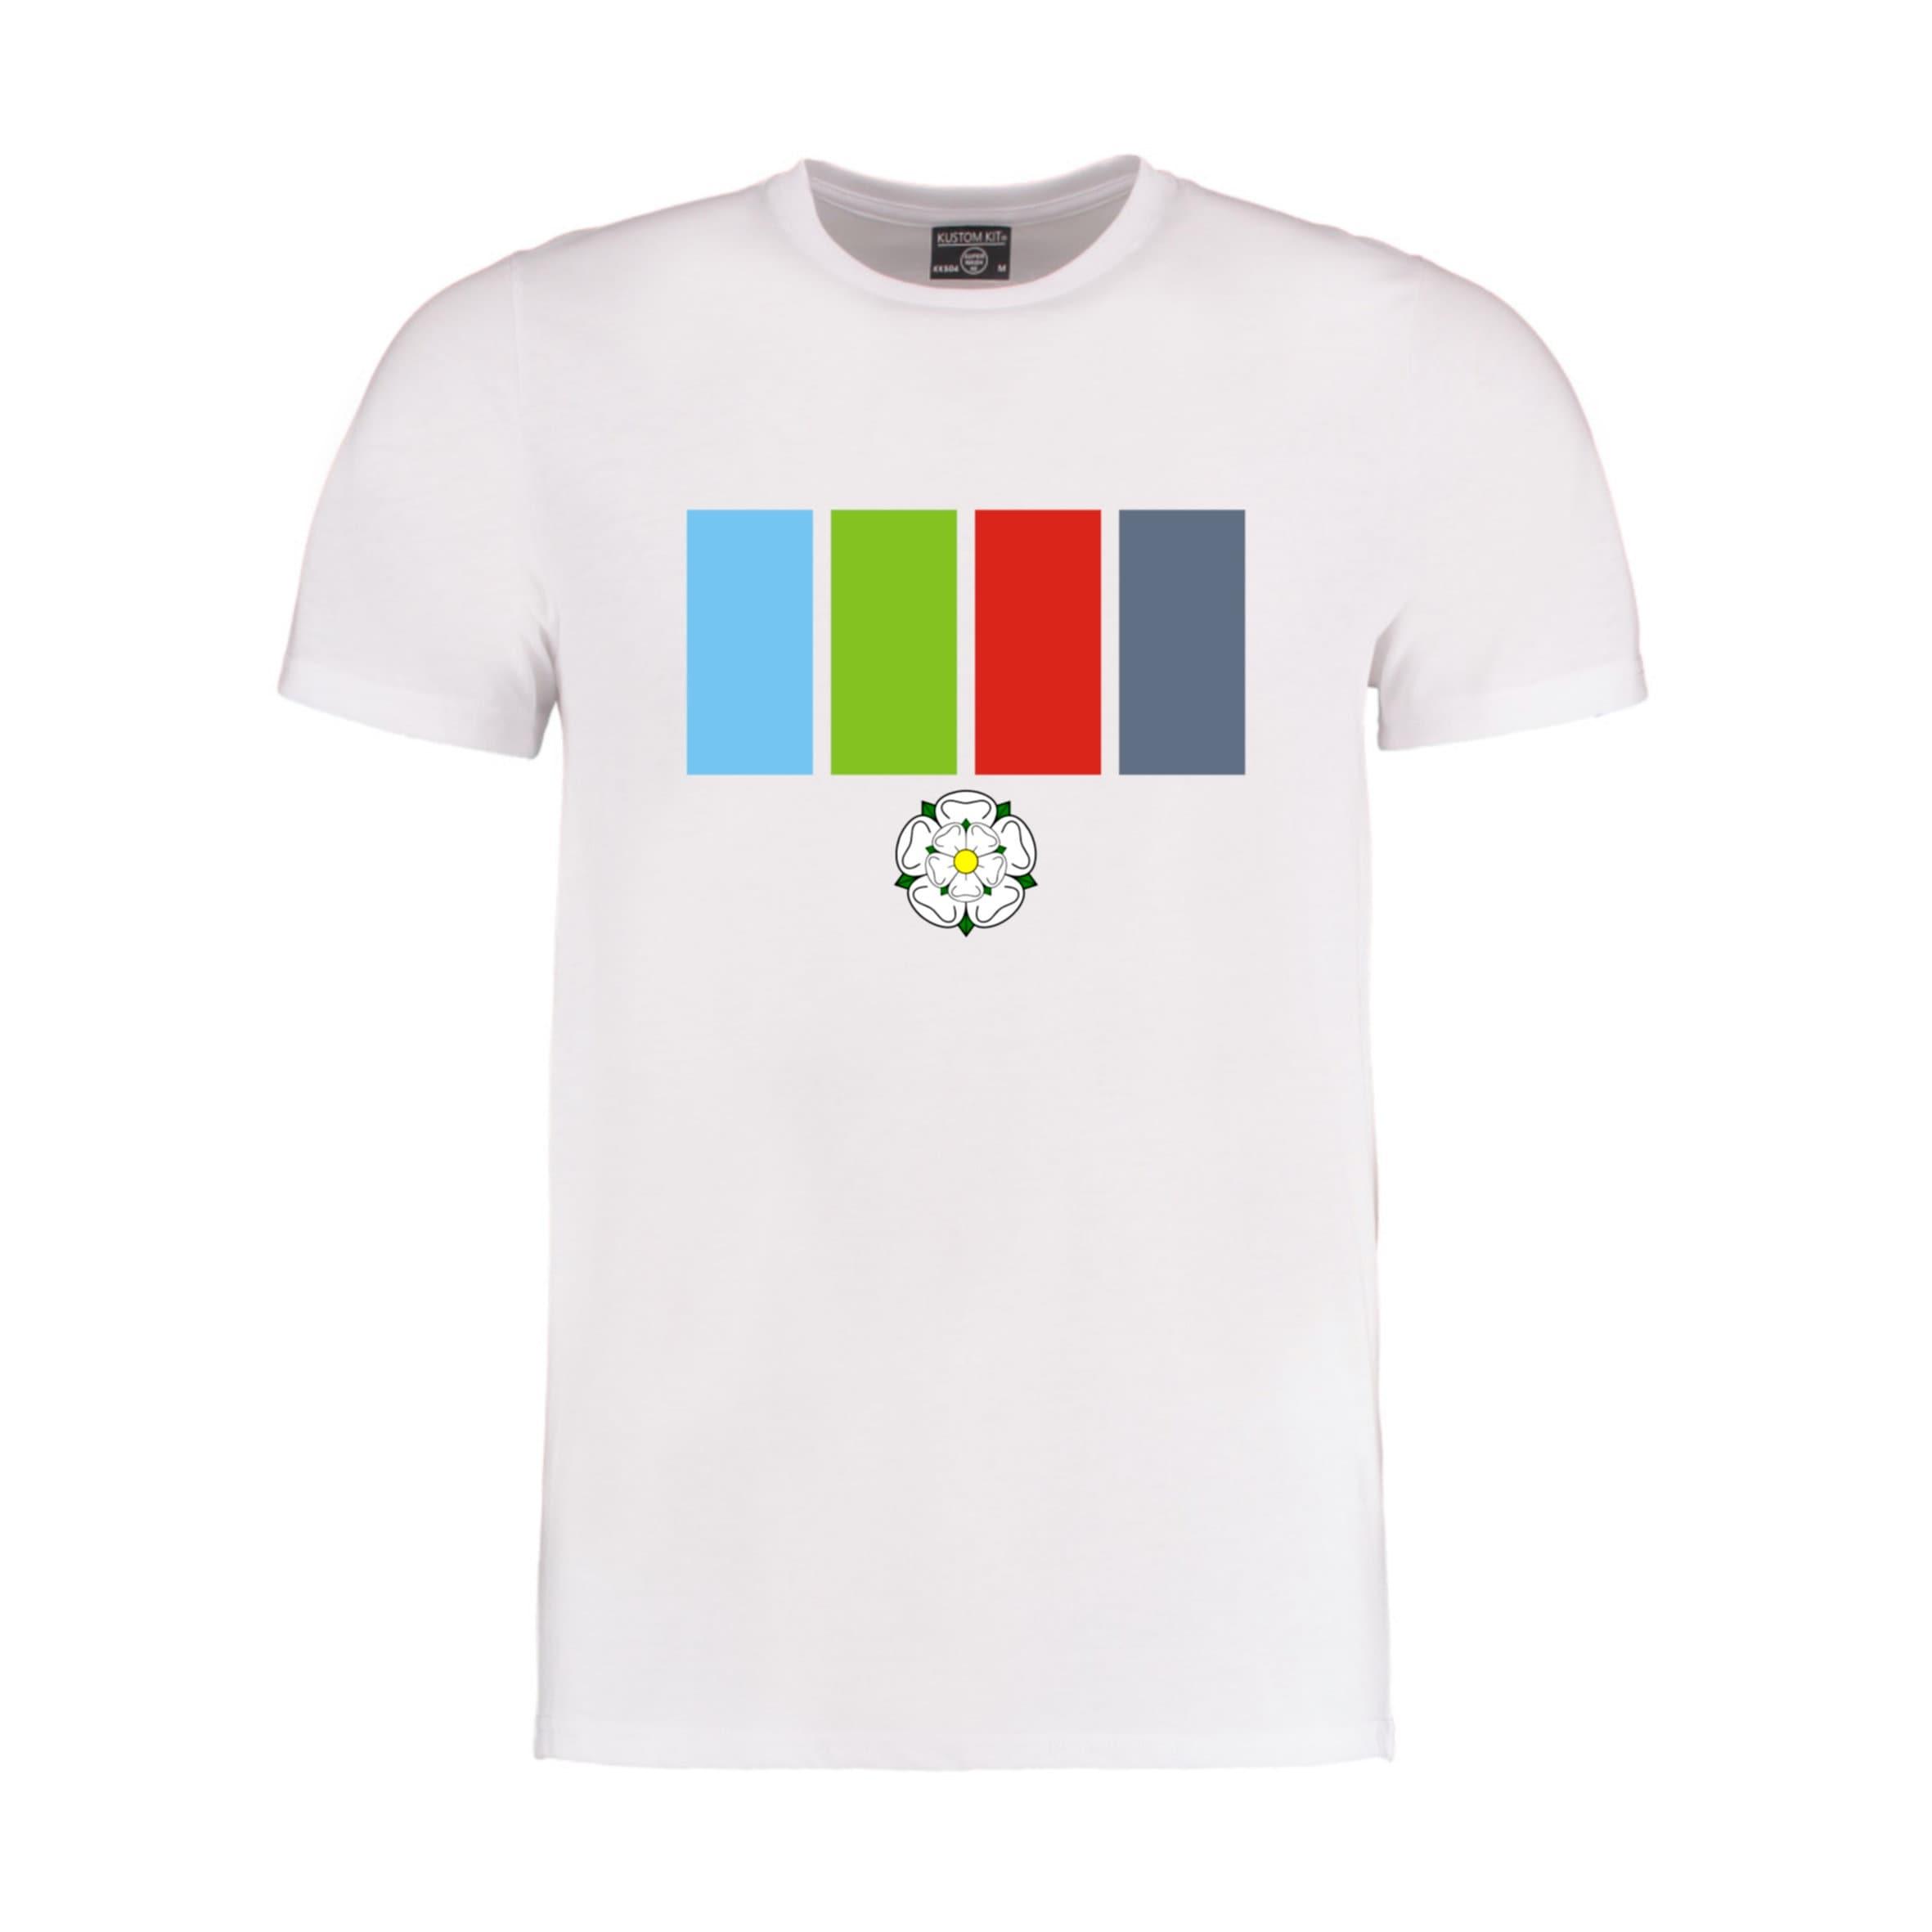 7ee0db785b73 Tour de Yorkshire t shirt, Men's unisex t shirt, Fathers Day gifts, Cycling  ...